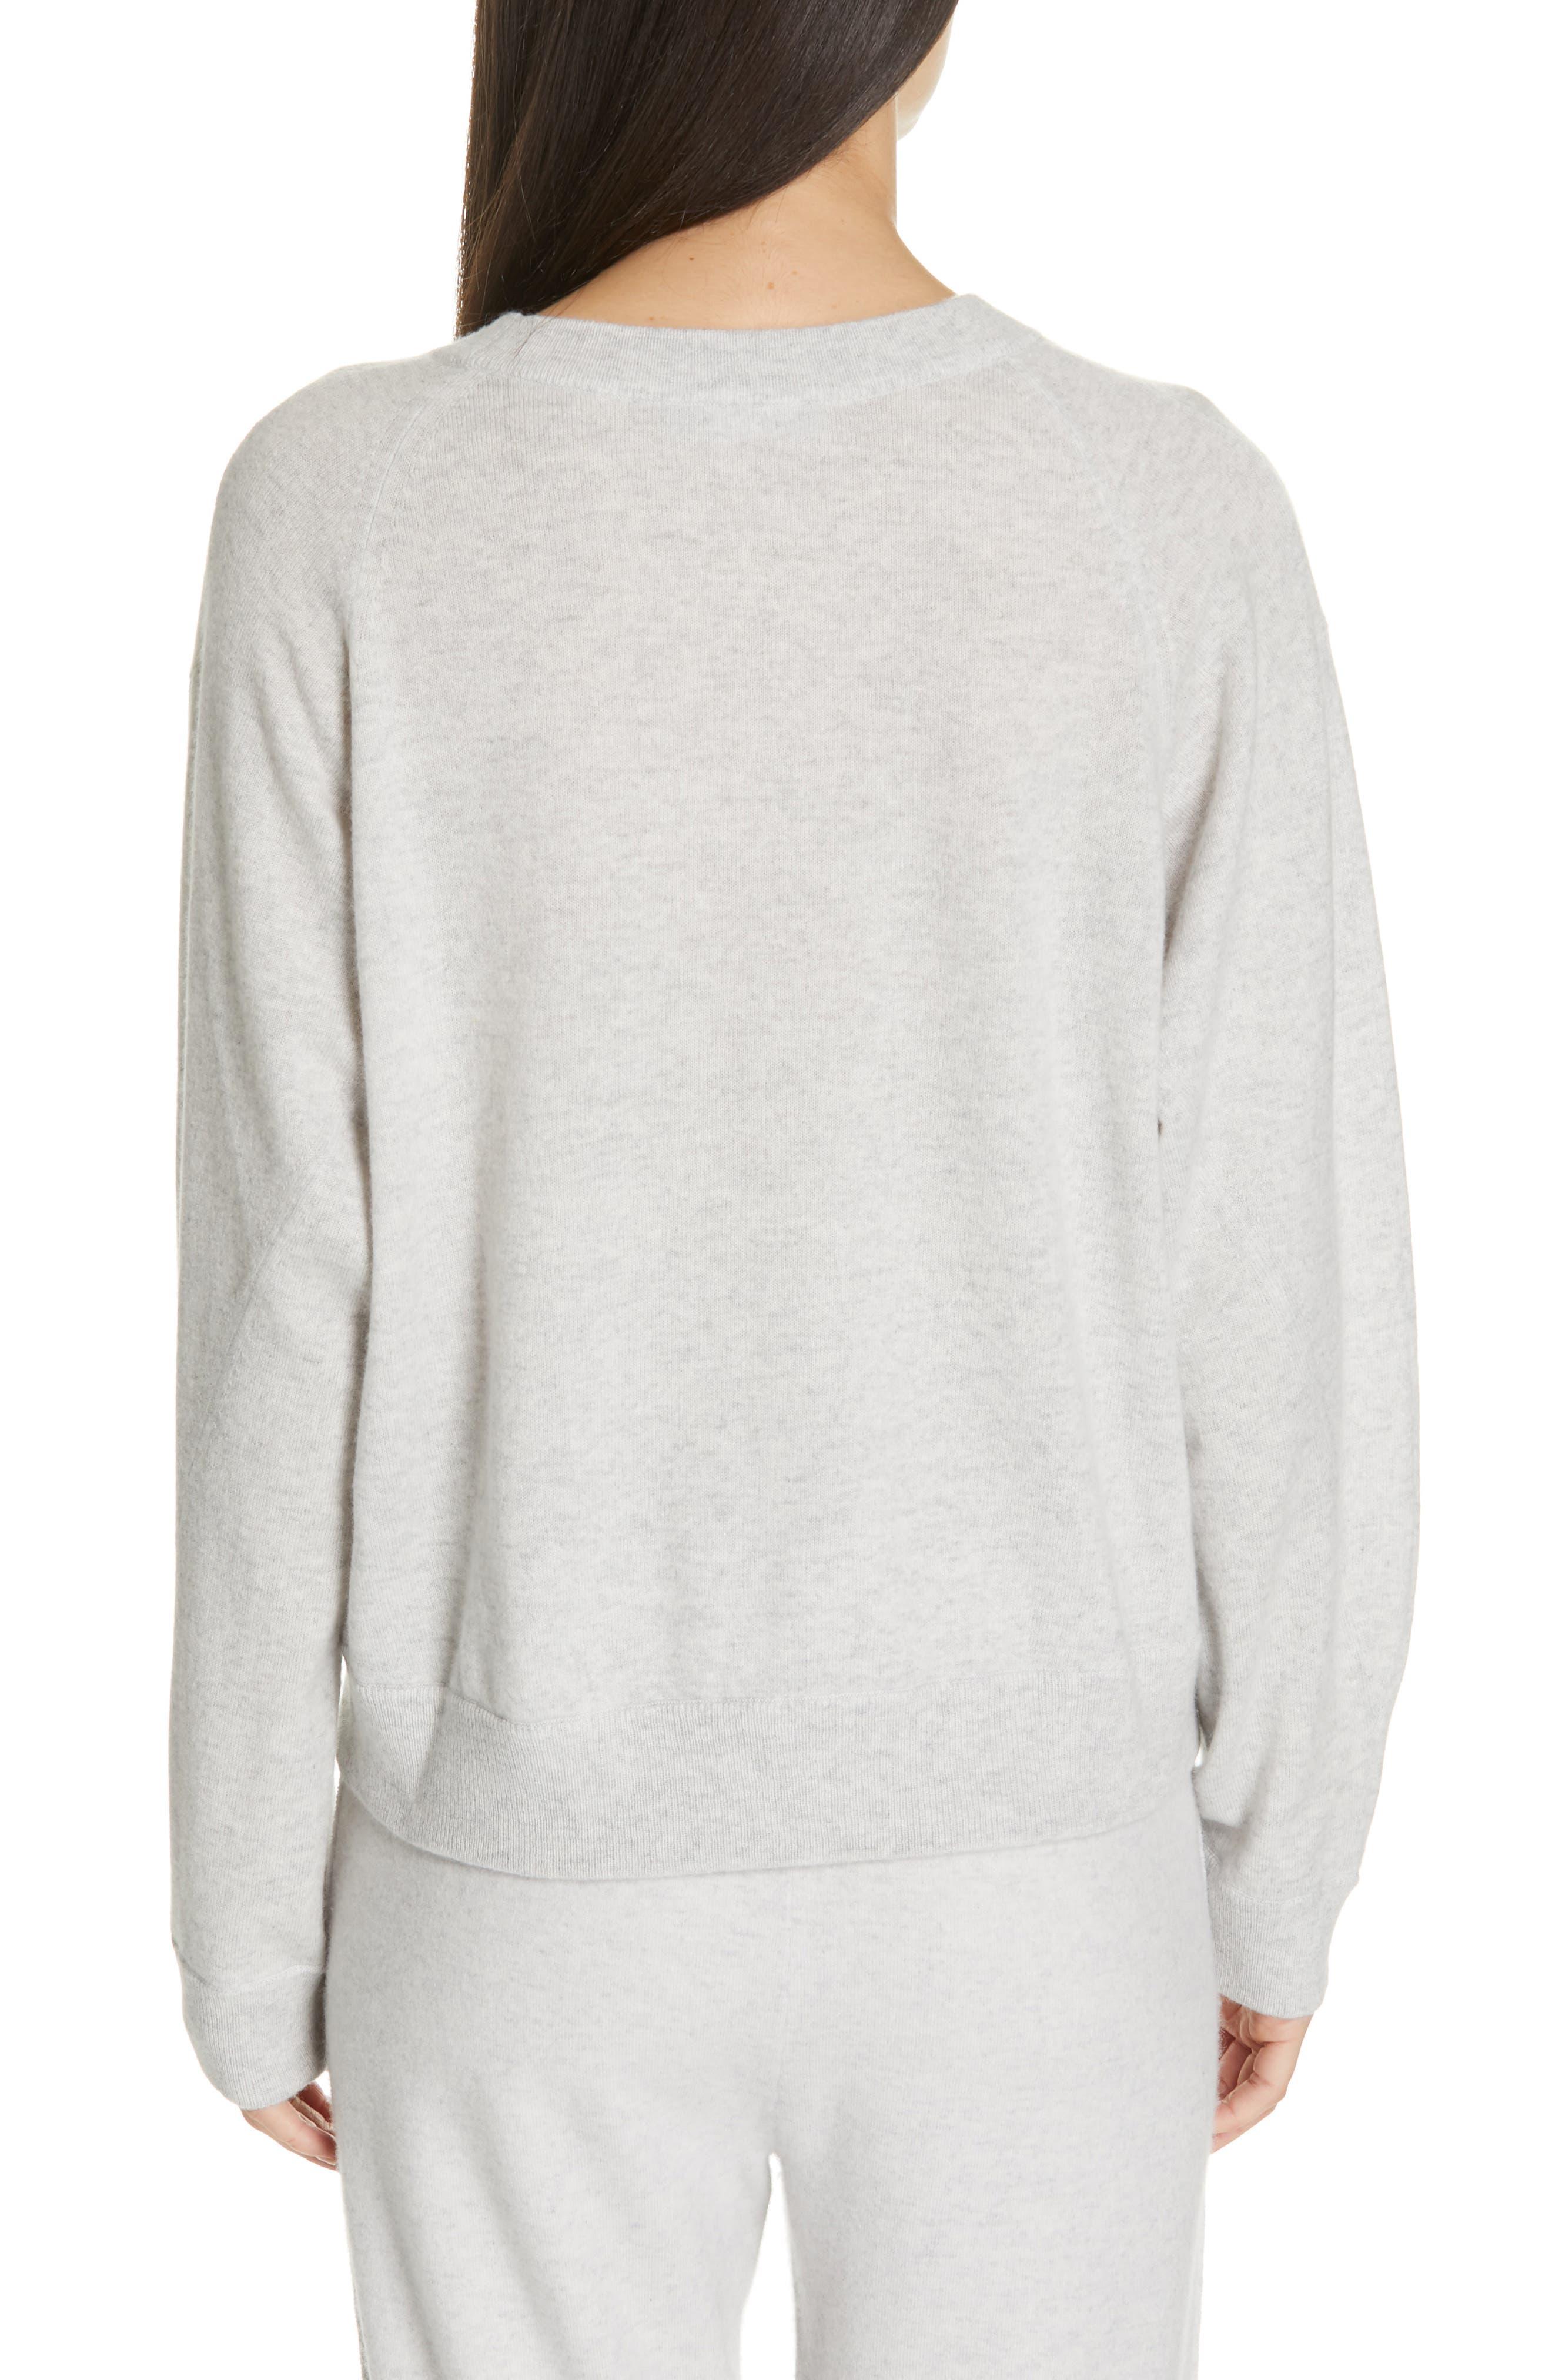 VINCE, Boxy Cashmere Sweater, Alternate thumbnail 2, color, LIGHT HEATHER GREY